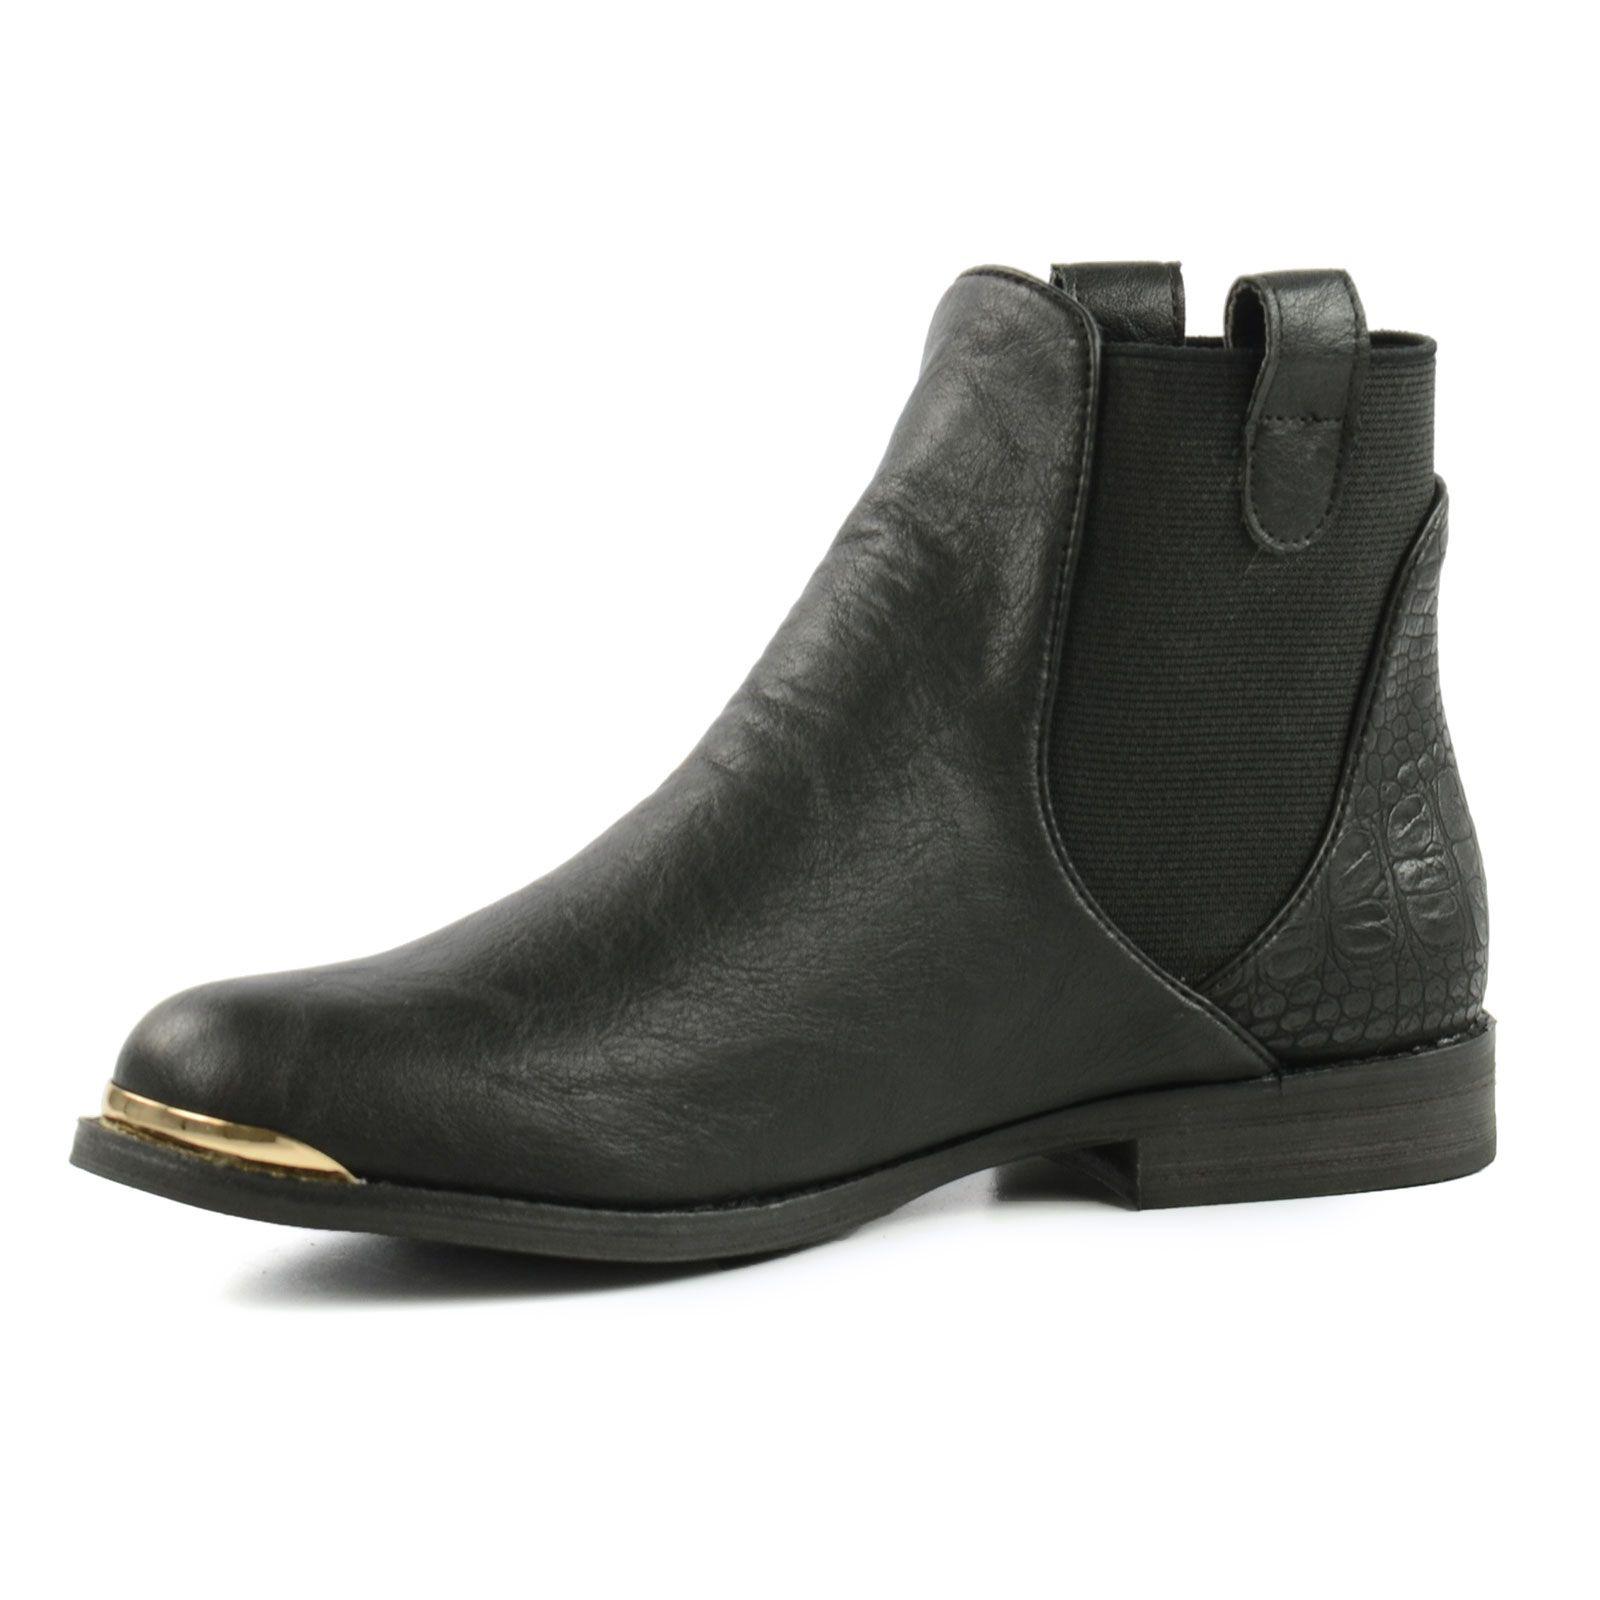 chelsea boots krokoprint schwarz damenschuhe. Black Bedroom Furniture Sets. Home Design Ideas